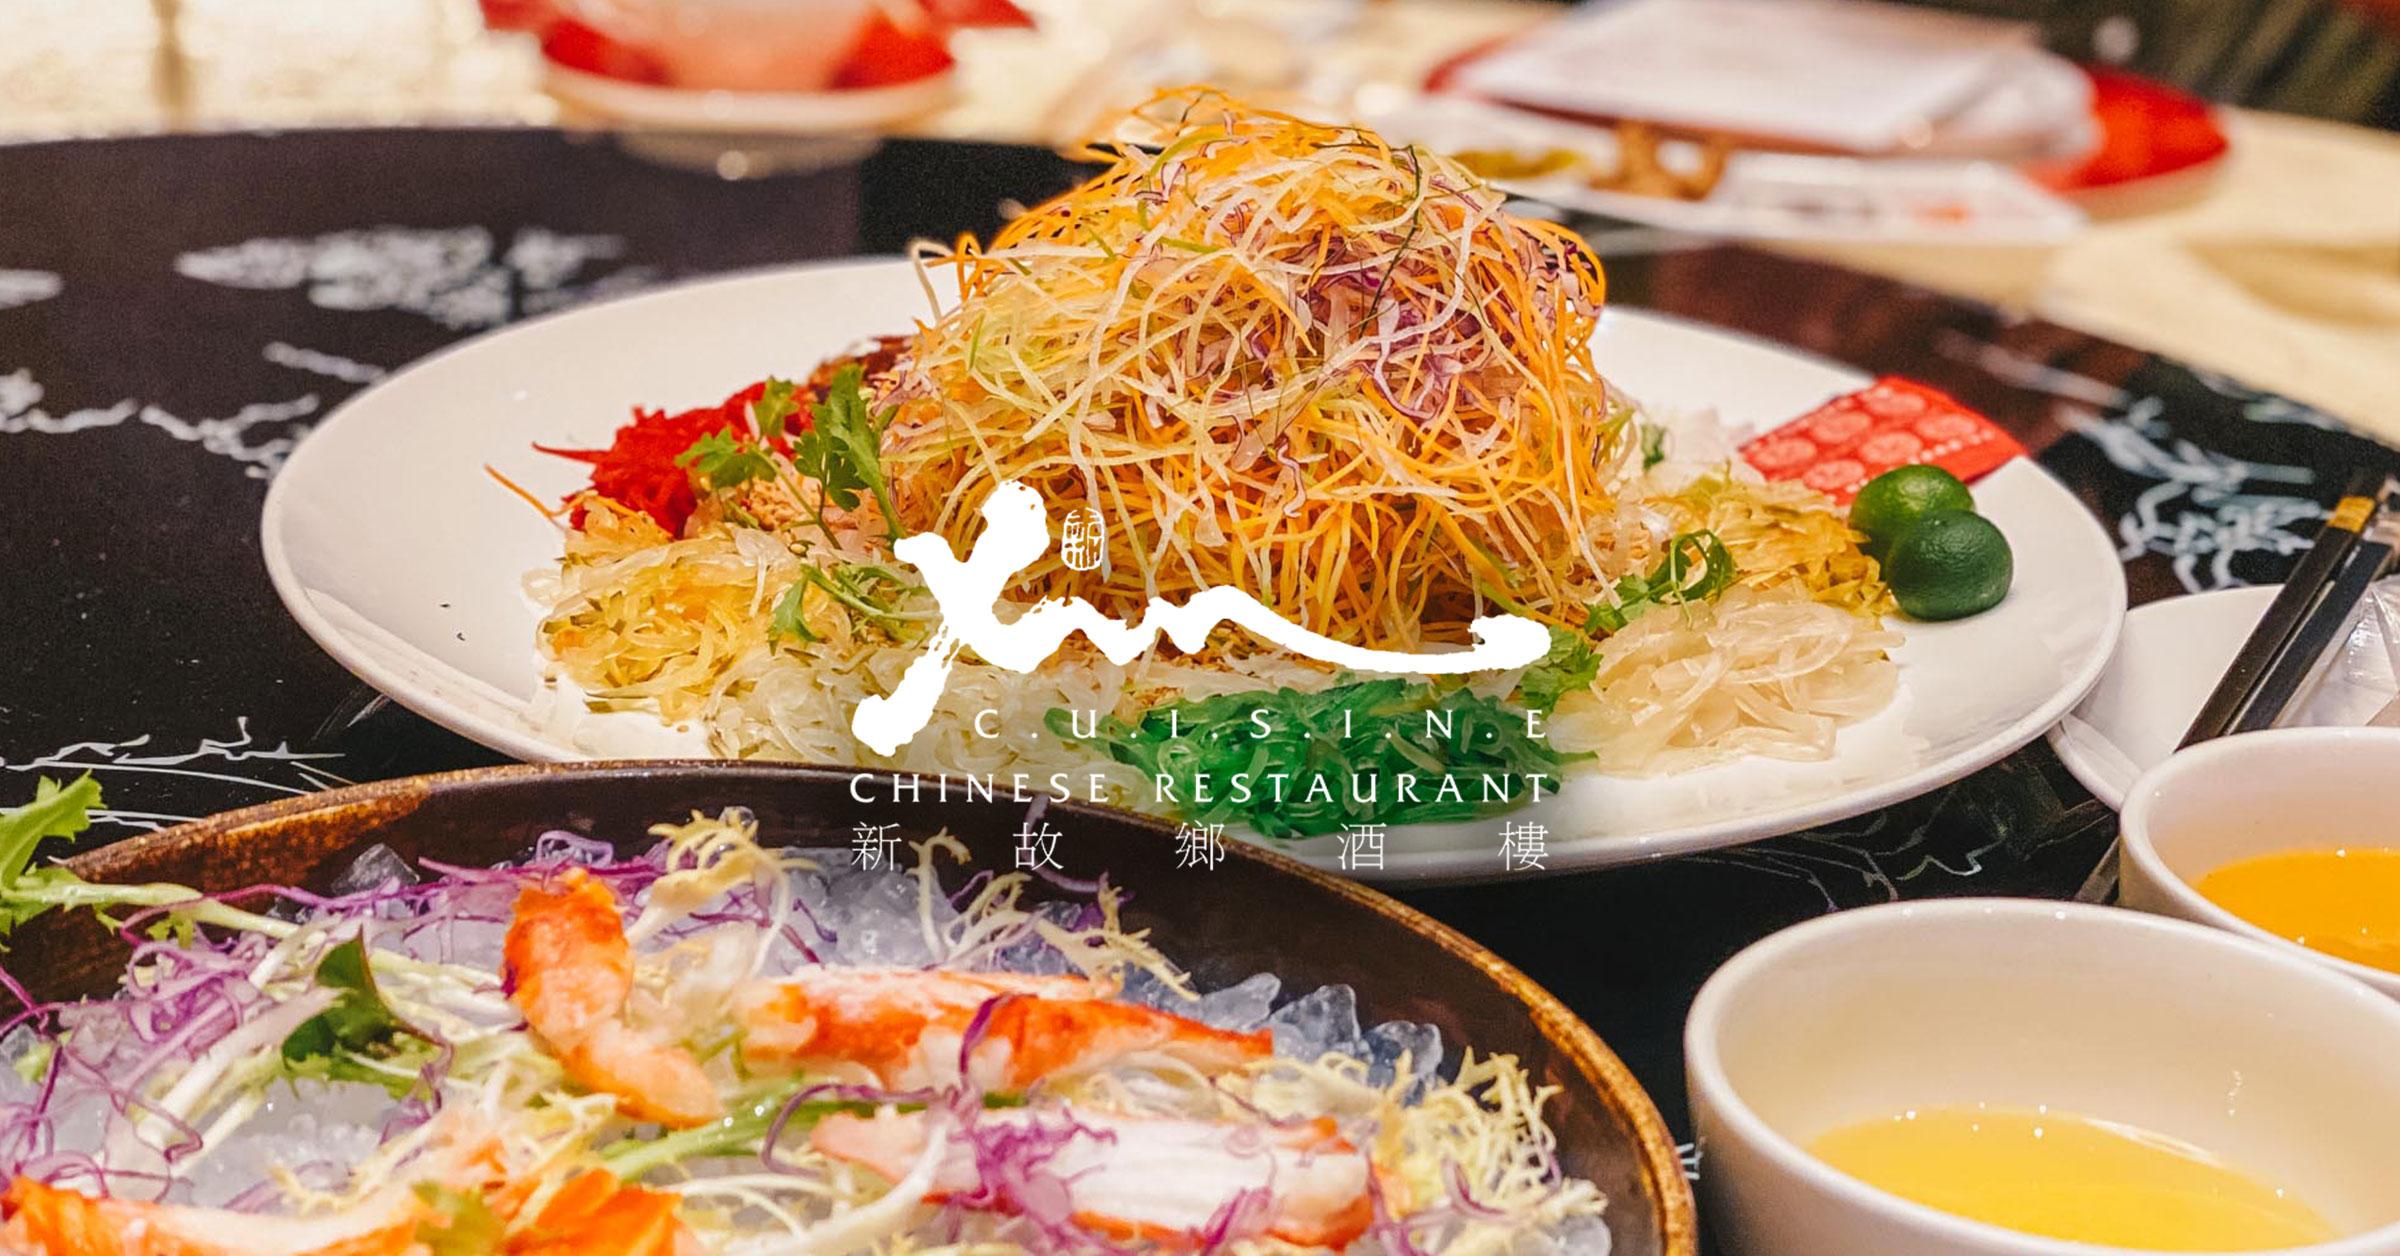 Xin-Cuisine-CNY-2021-Holiday-Inn-Singapore-Atrium-darrenbloggie_featured